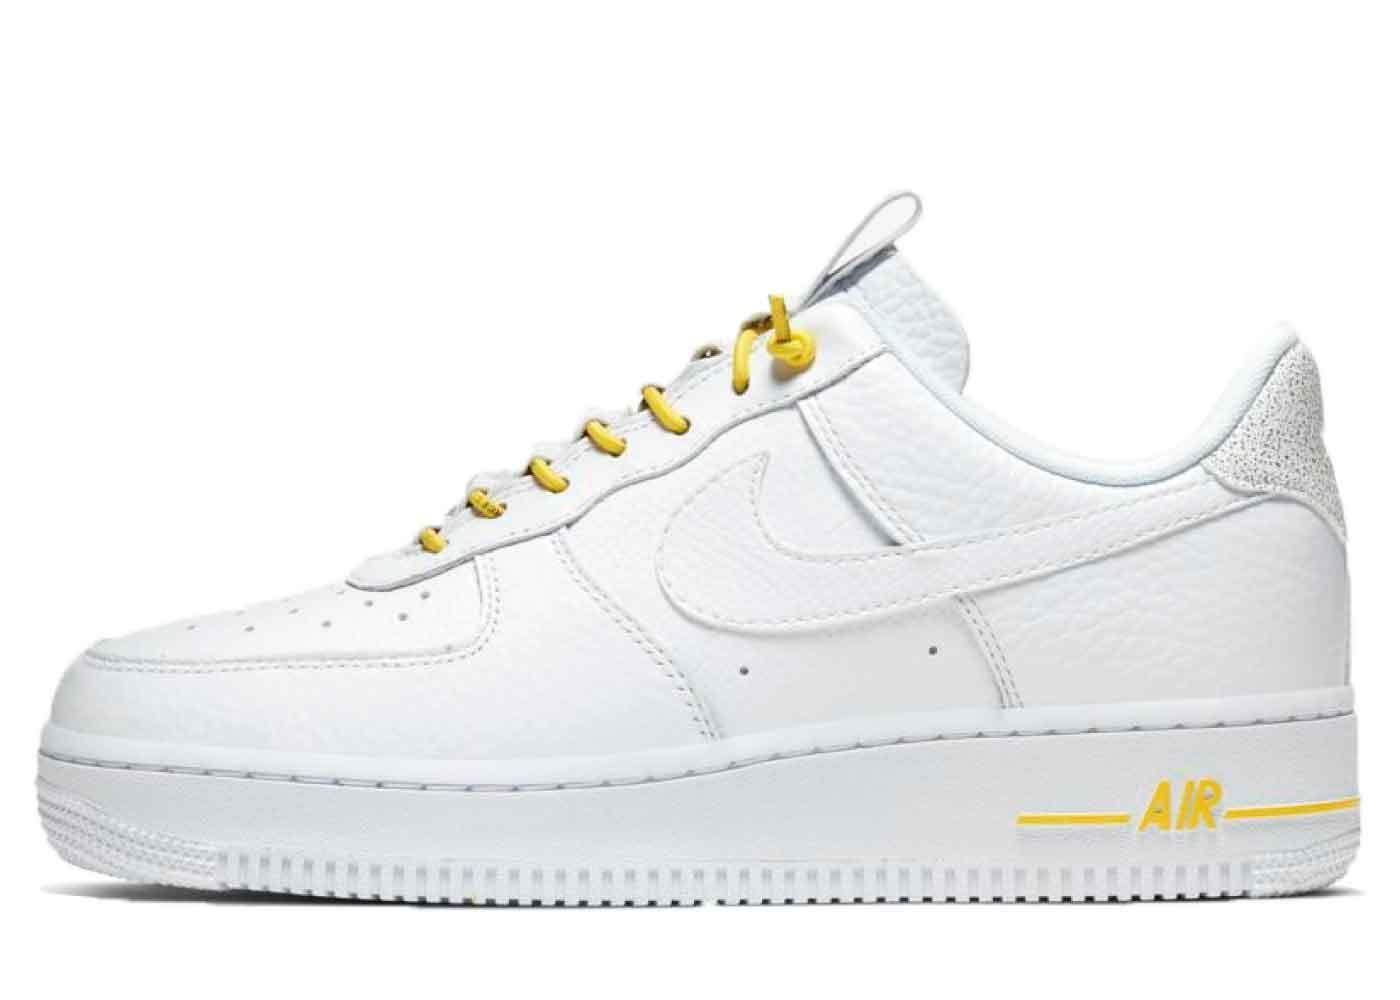 Nike Air Force 1 Lux White Chrome Yellow Womensの写真